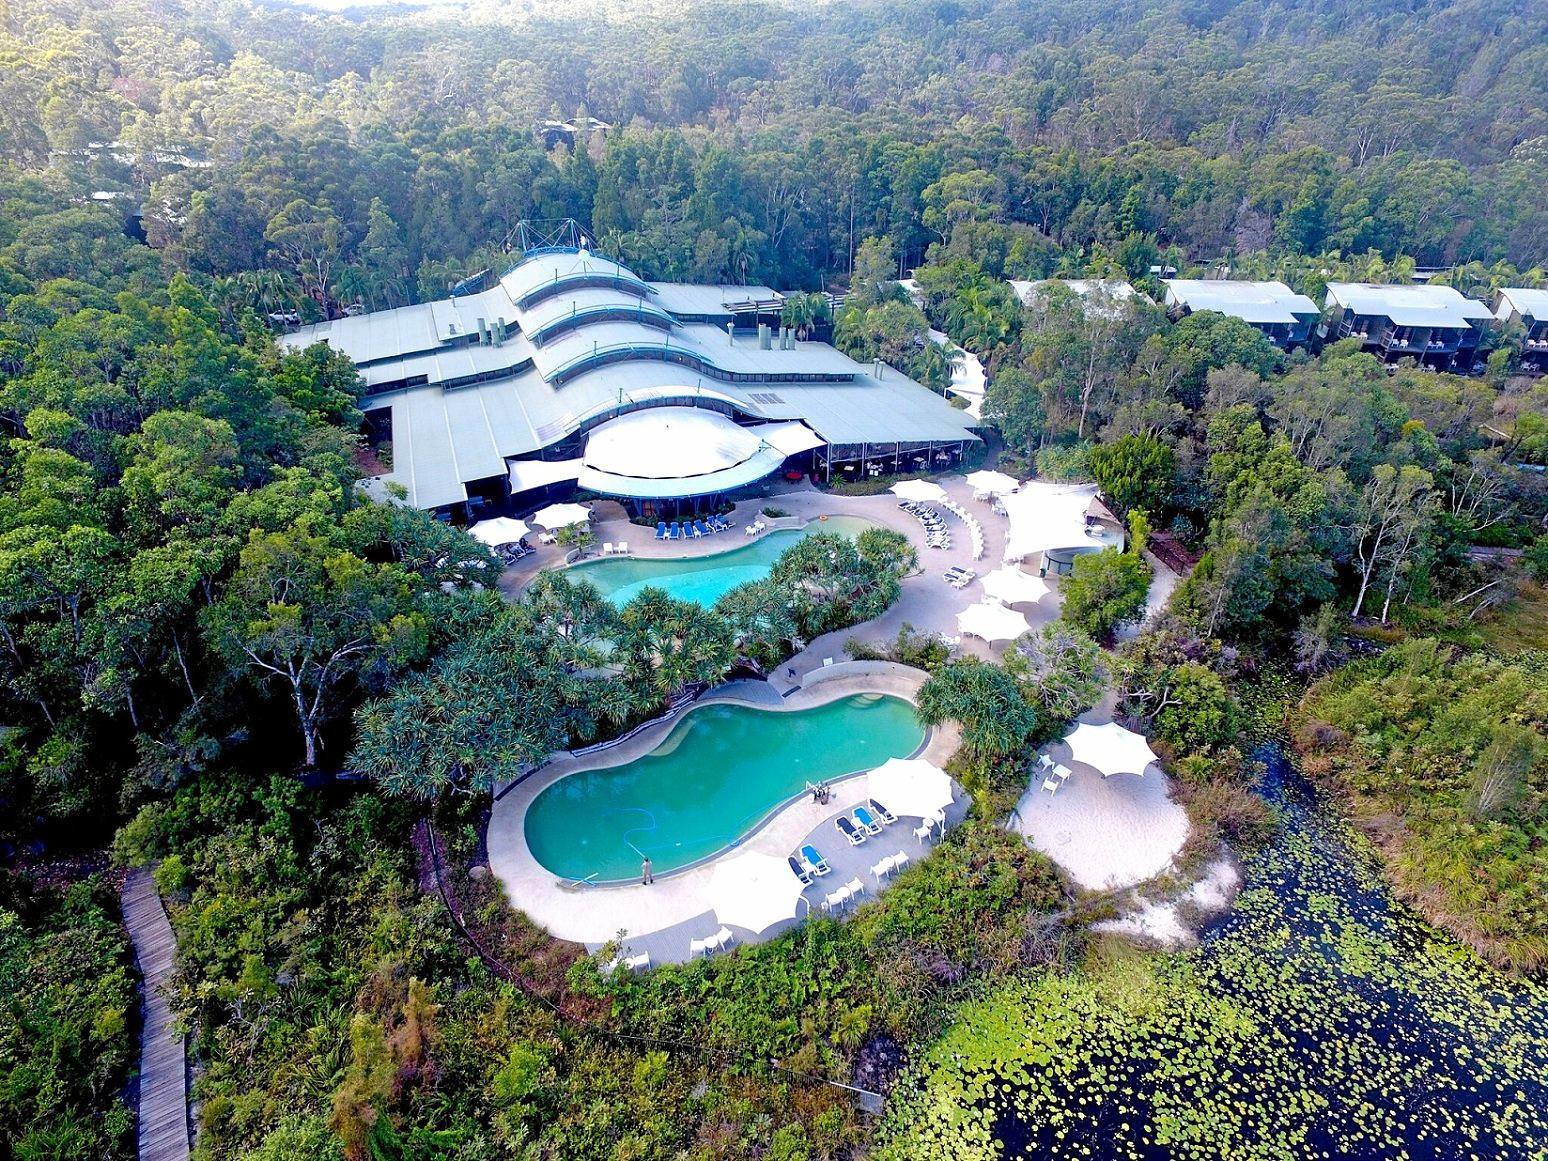 Aerial image of Kingfisher Bay Resort.